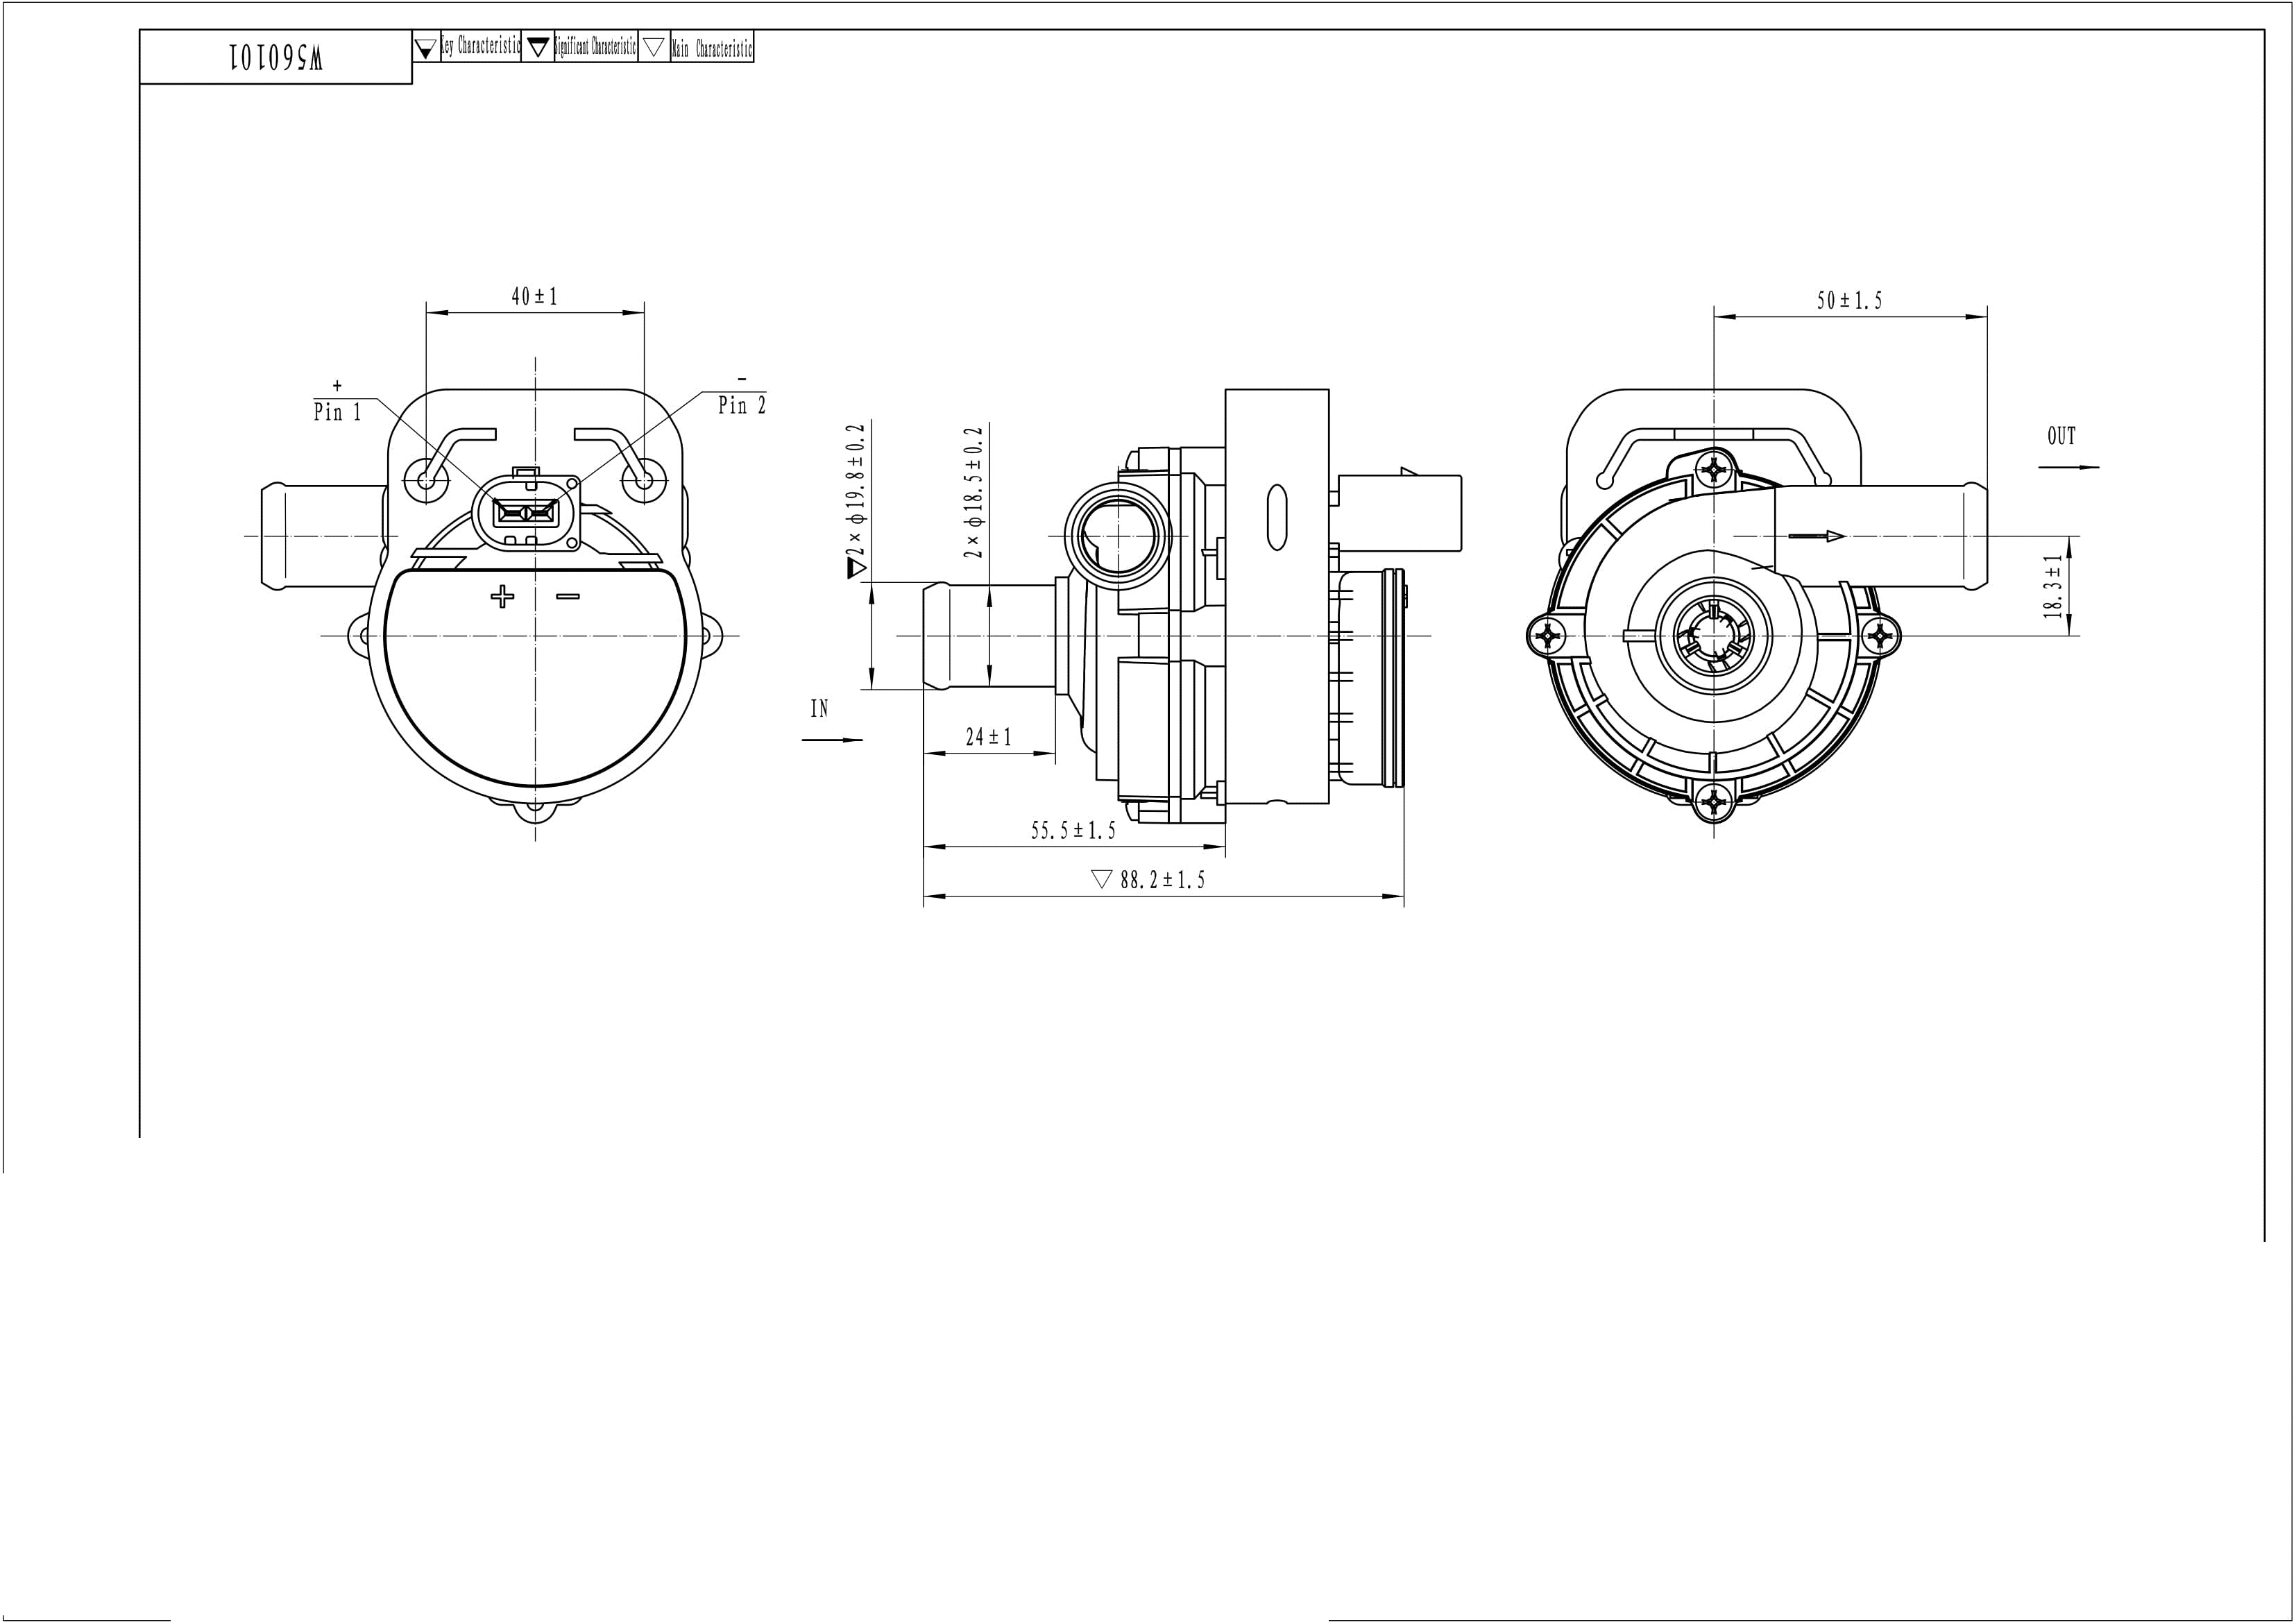 WEBURG - Электрические водяные помпы mercedes-benz, vw crafter 2.5tdi 06-11/2.0tdi 11> 12v,5 kpa,850lph